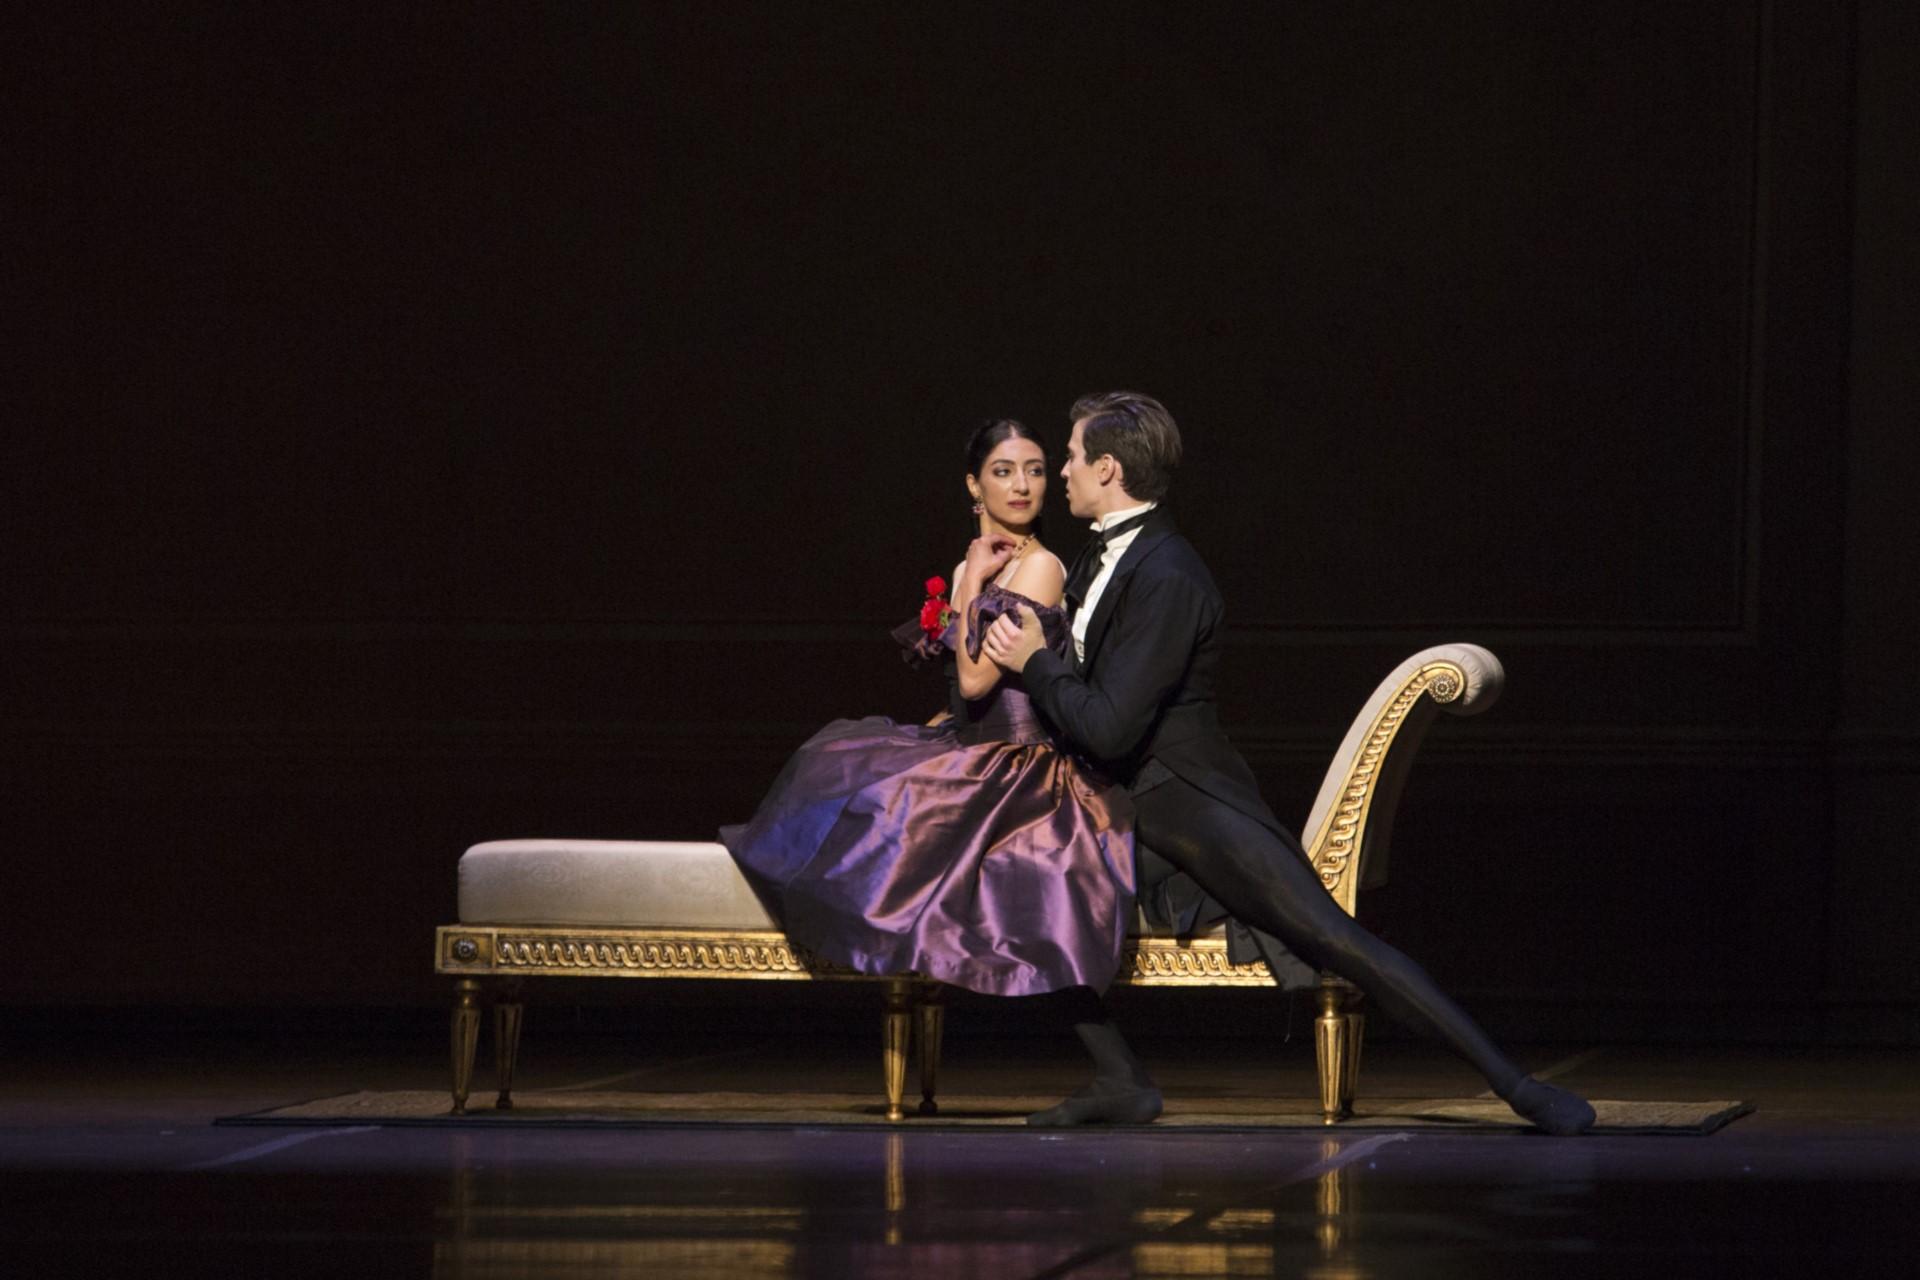 Chinara Alizade : Teatr Wielki Opera Narodowa